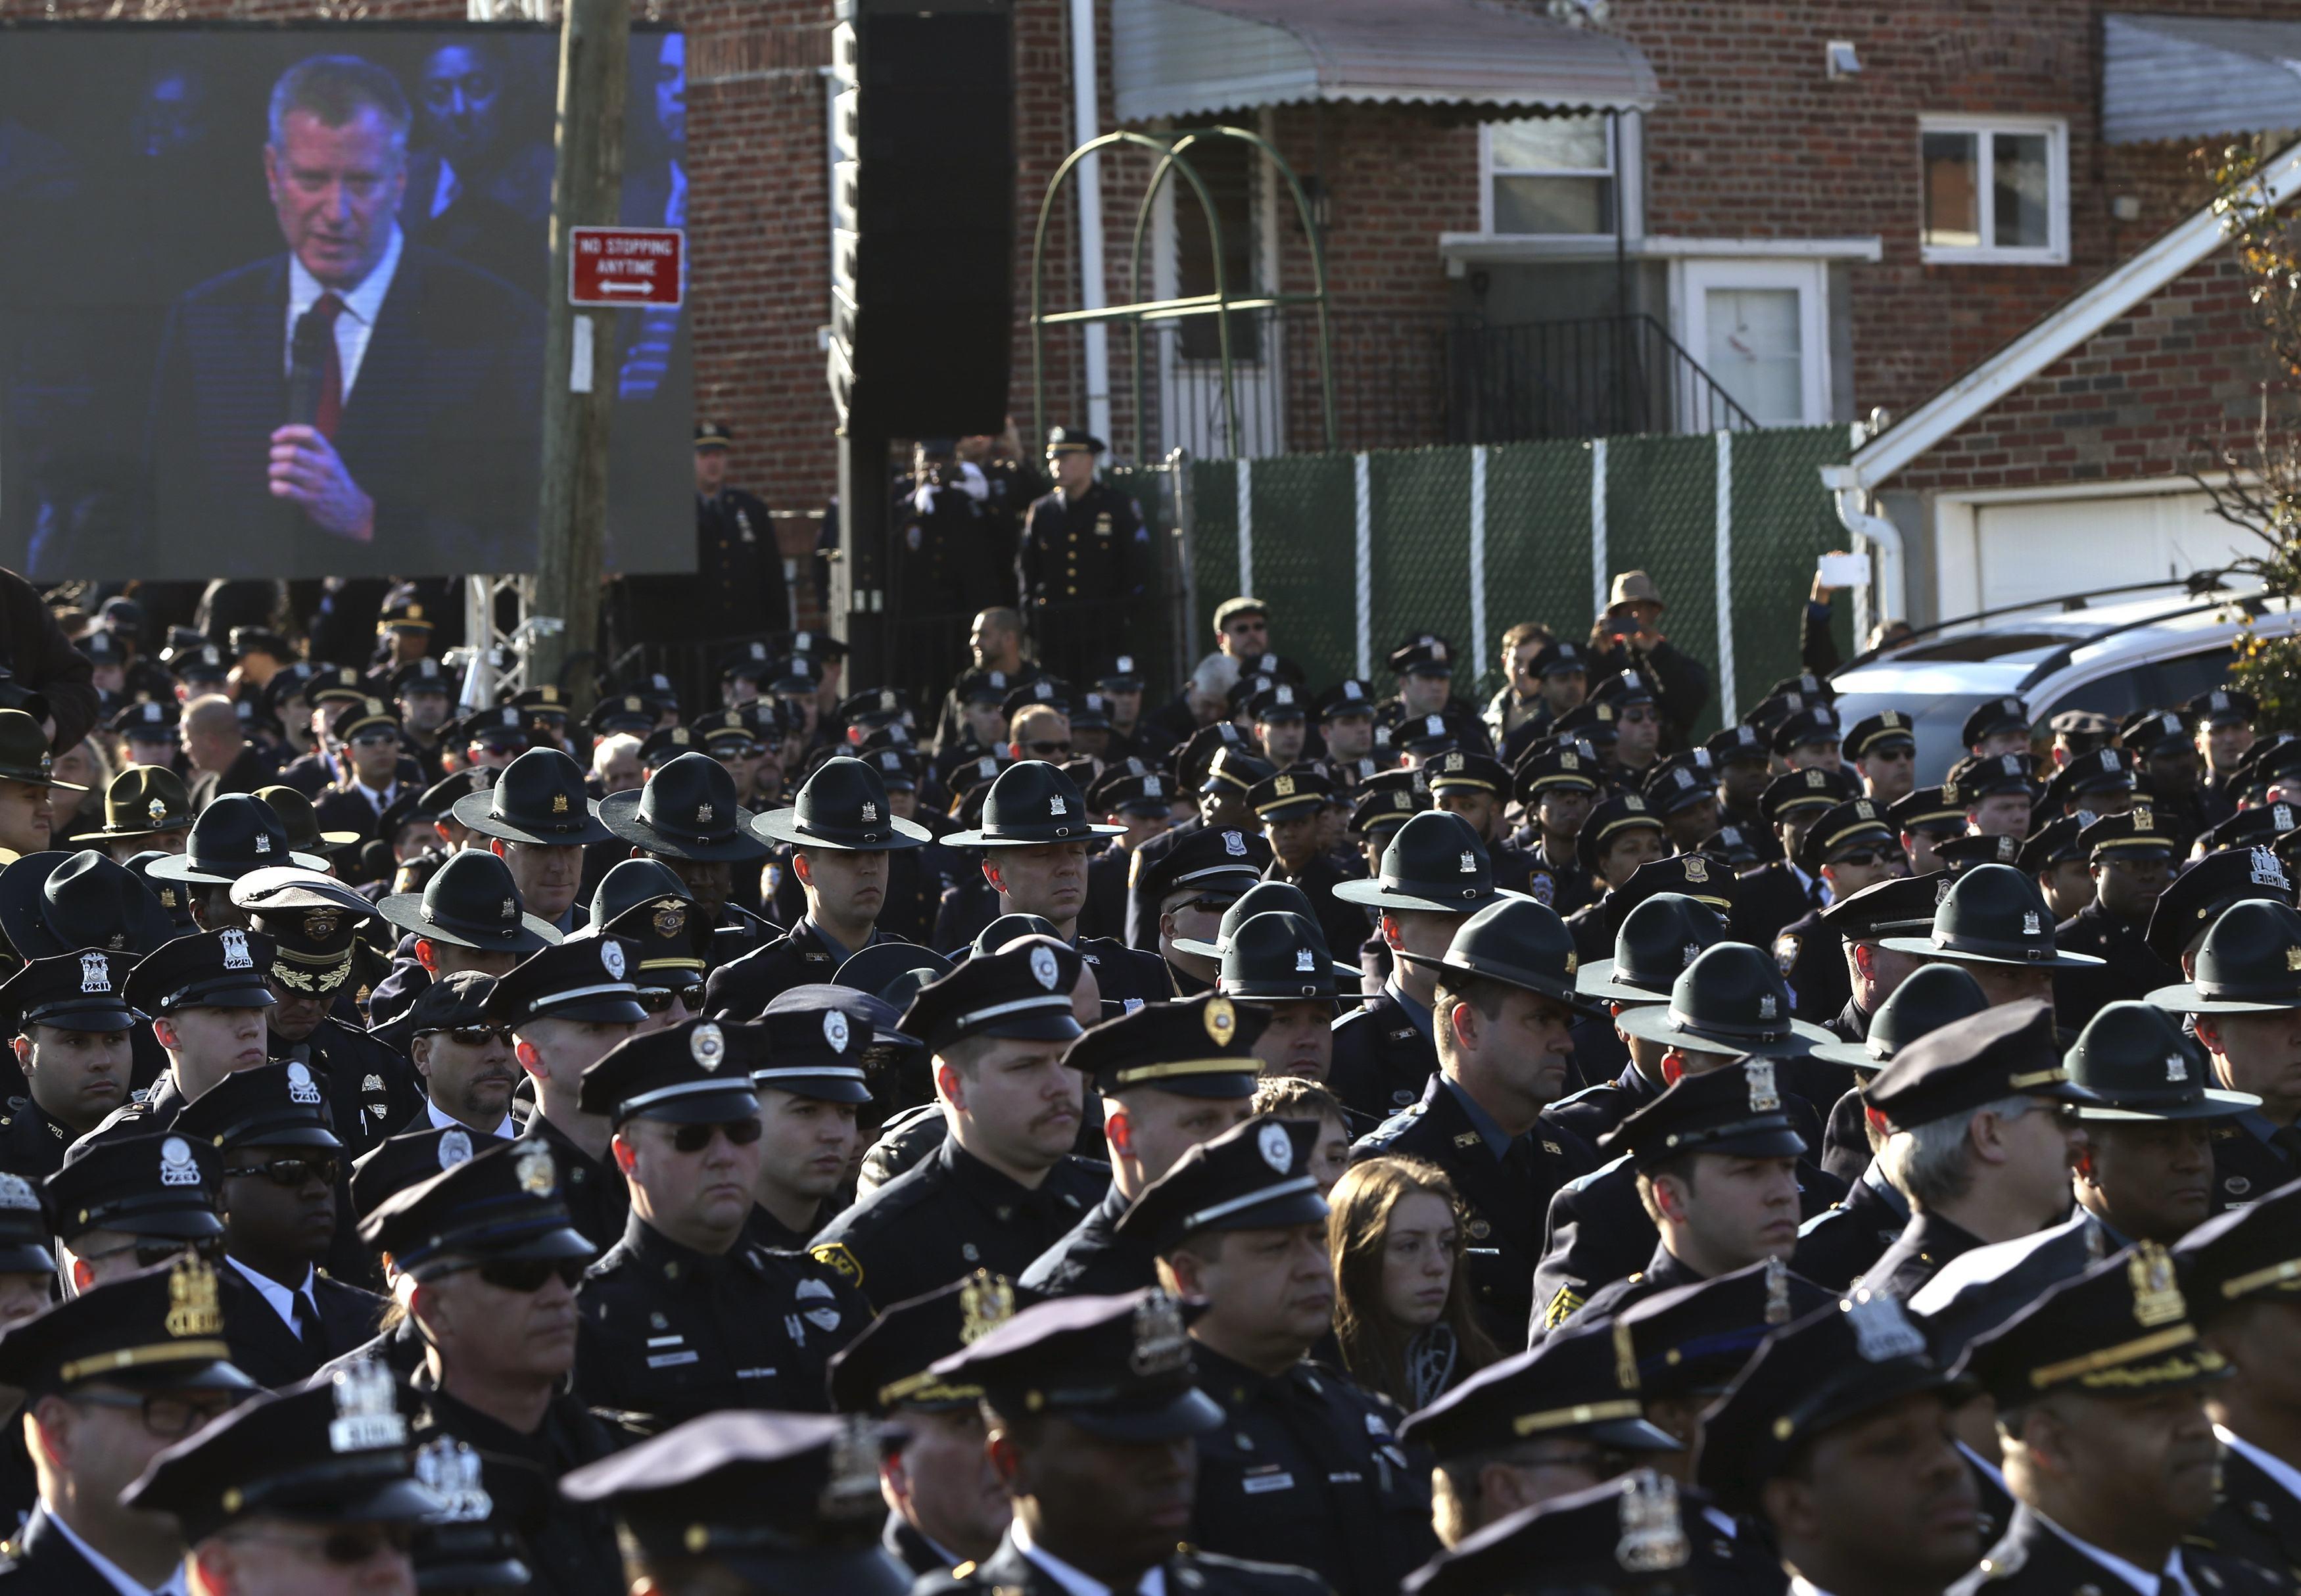 New York Police Commissioner Sanctuary City